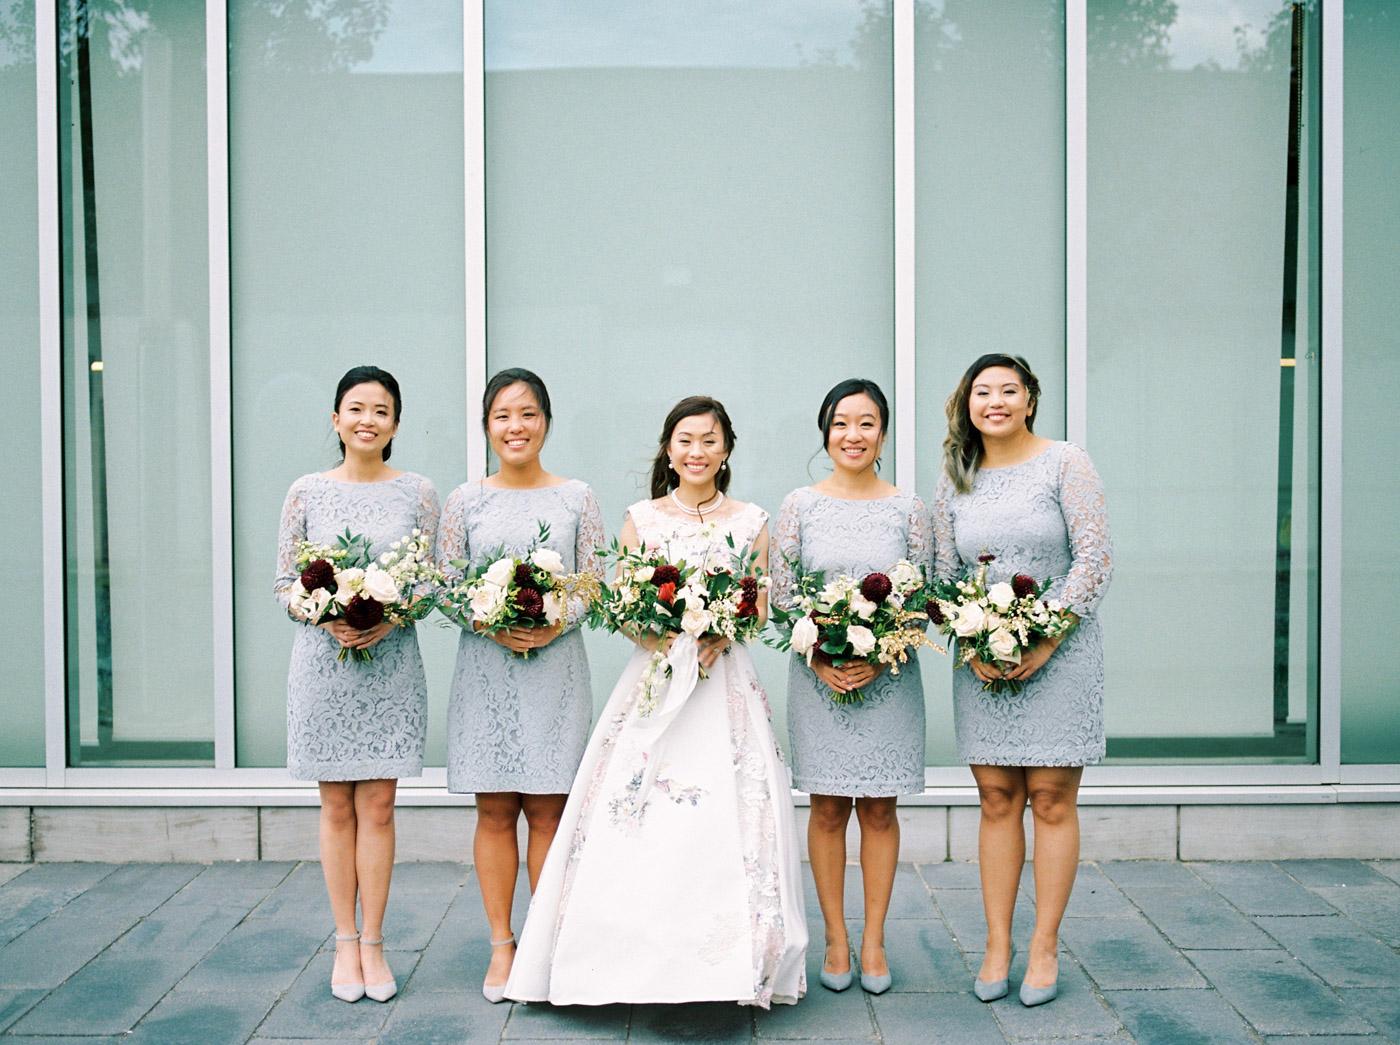 toronto_wedding_photographer_documentary_fine_art_photography-31.jpg